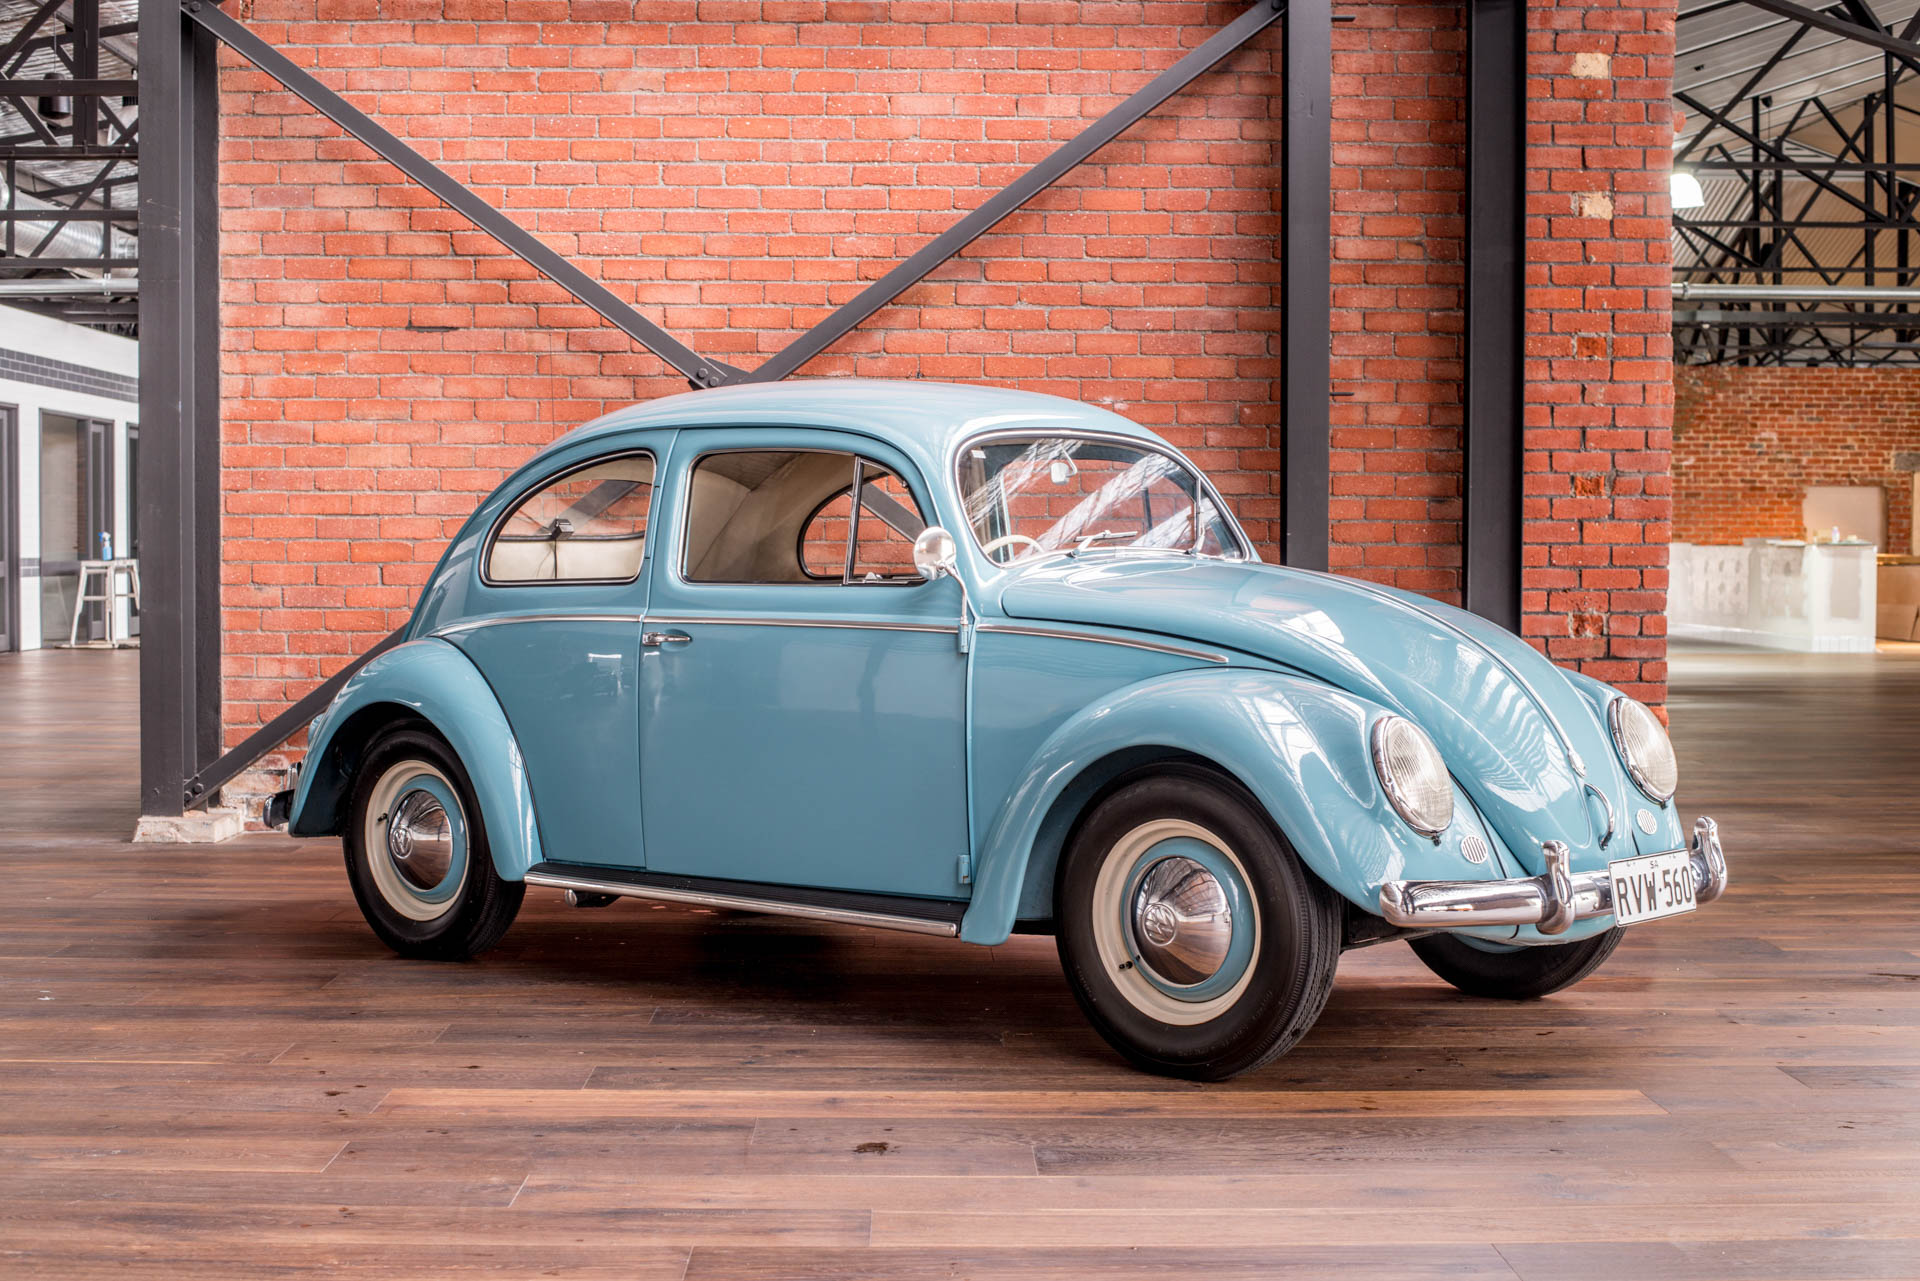 1956 VW Beetle - Richmonds Prestige, Sports & Classic Cars Adelaide SA